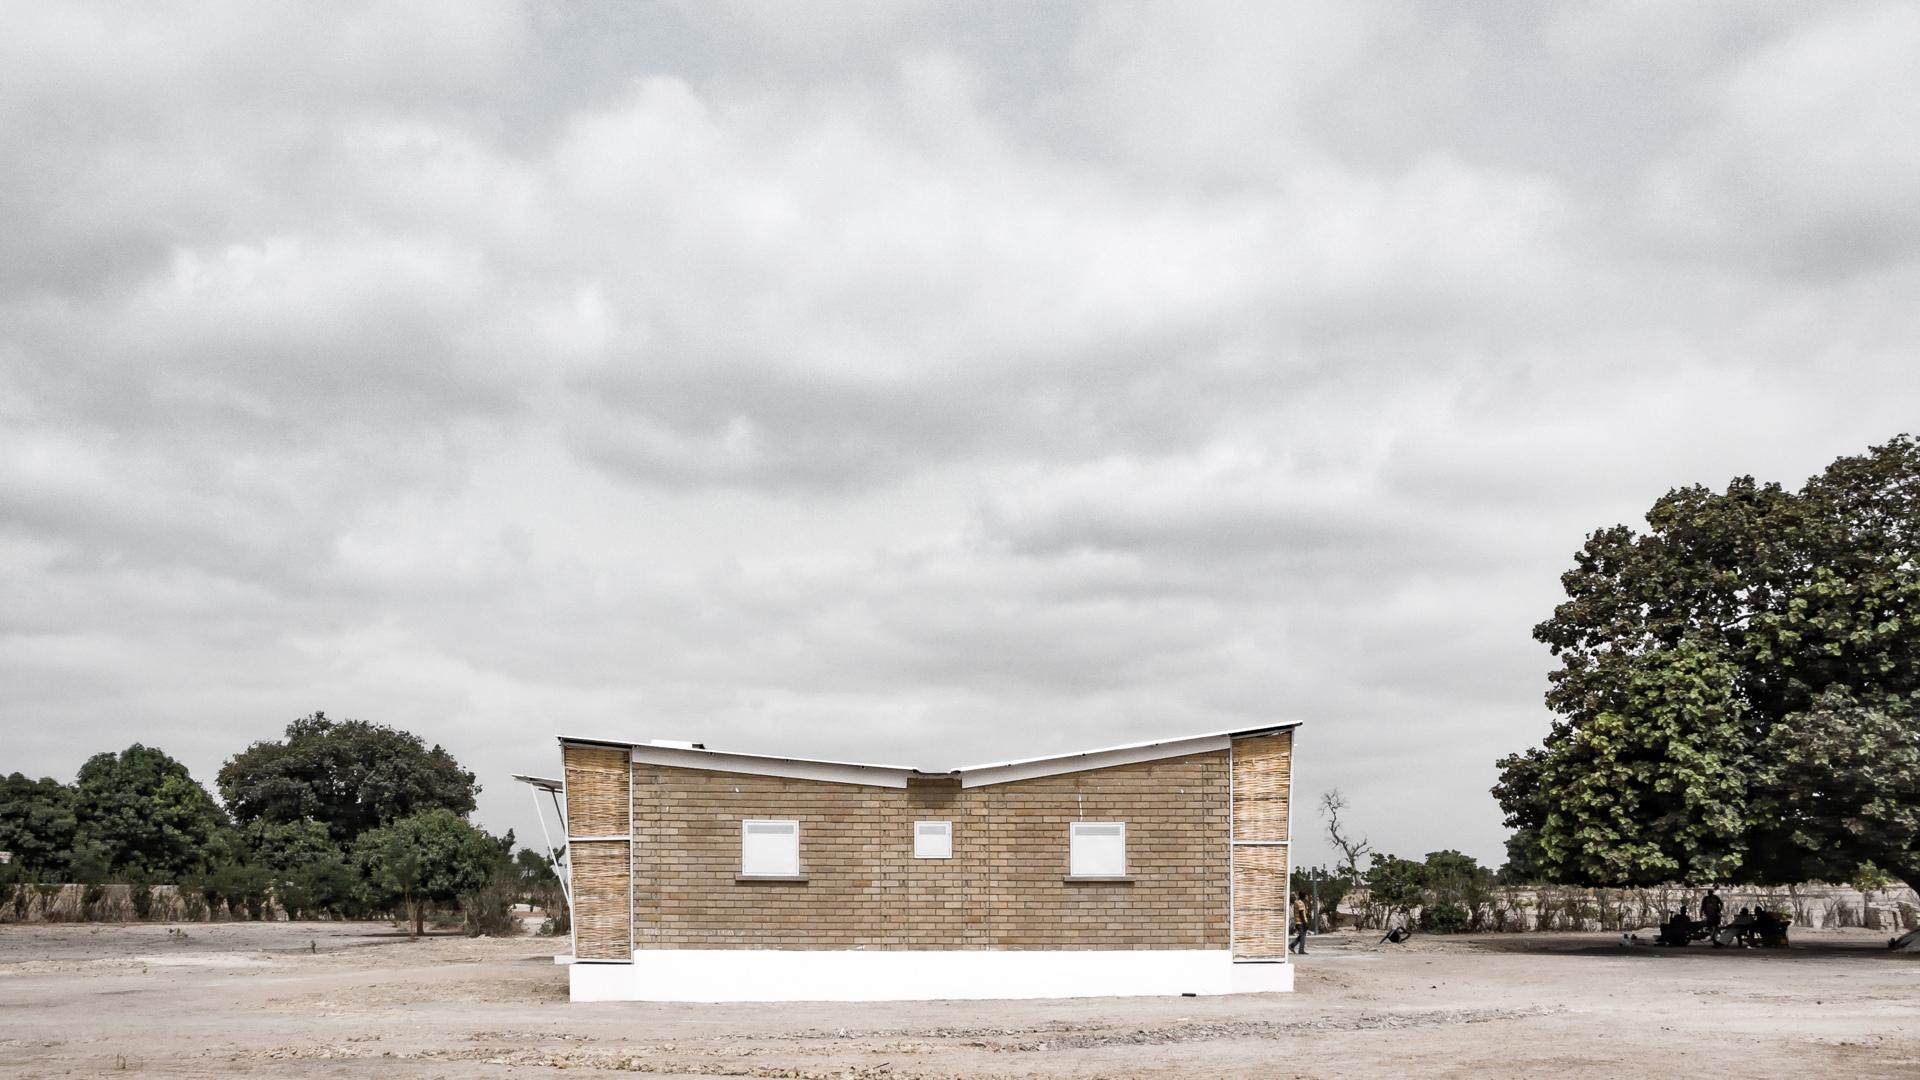 TAMassociati: the H2OS pilot eco-village in Senegal